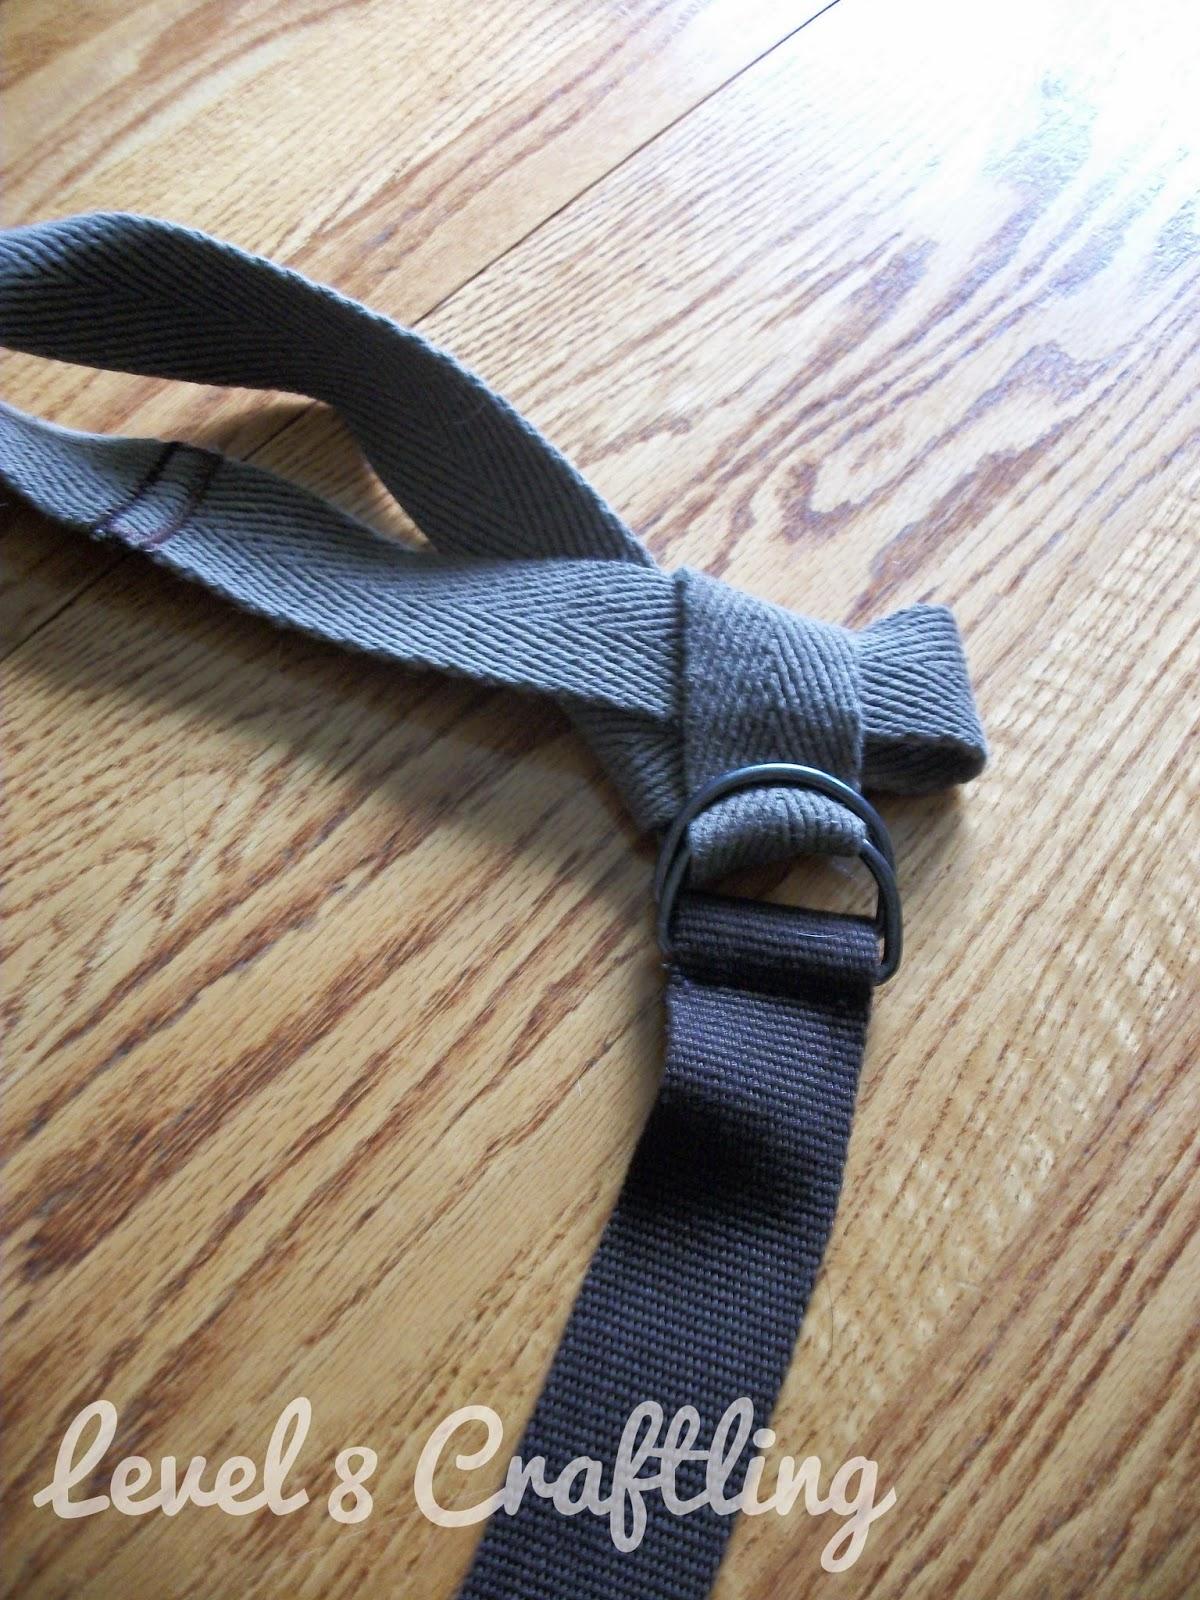 Level 8 Craftling Yoga Mat Holder From Old Pants Strap